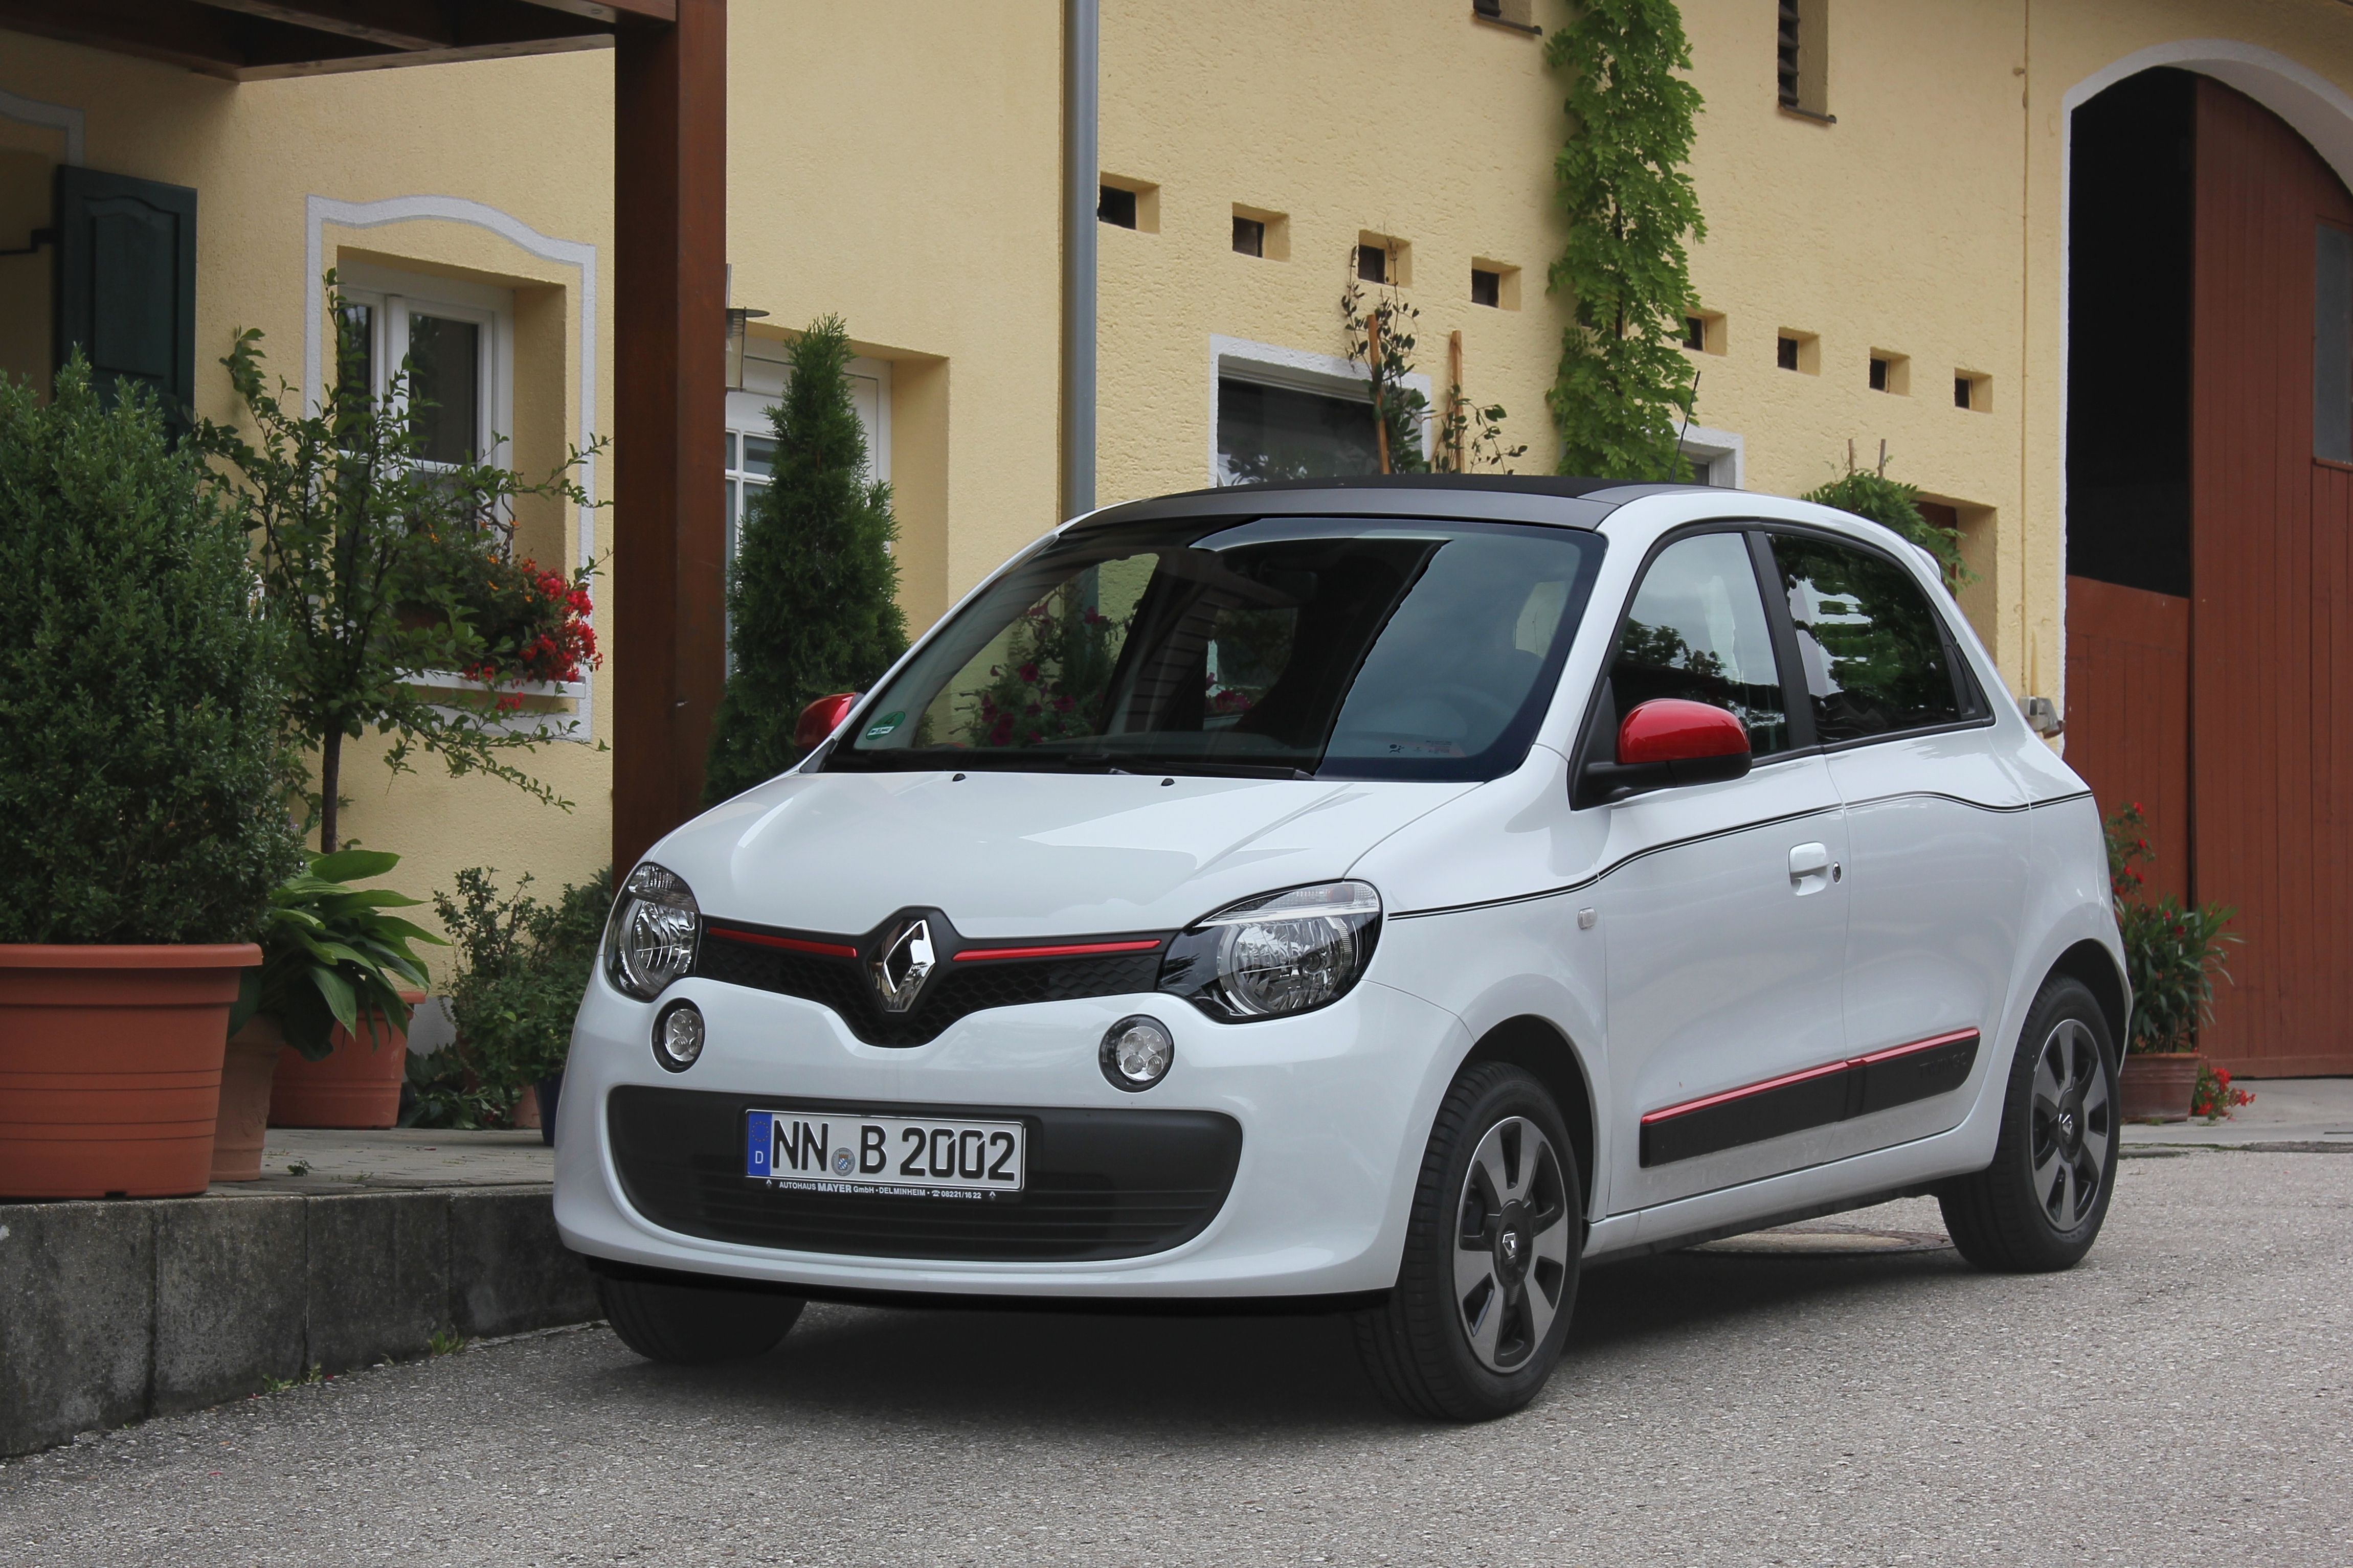 Renault Twingo Wikipedia 5d36f174ae584ae3f03694ec7f080005 Lesser